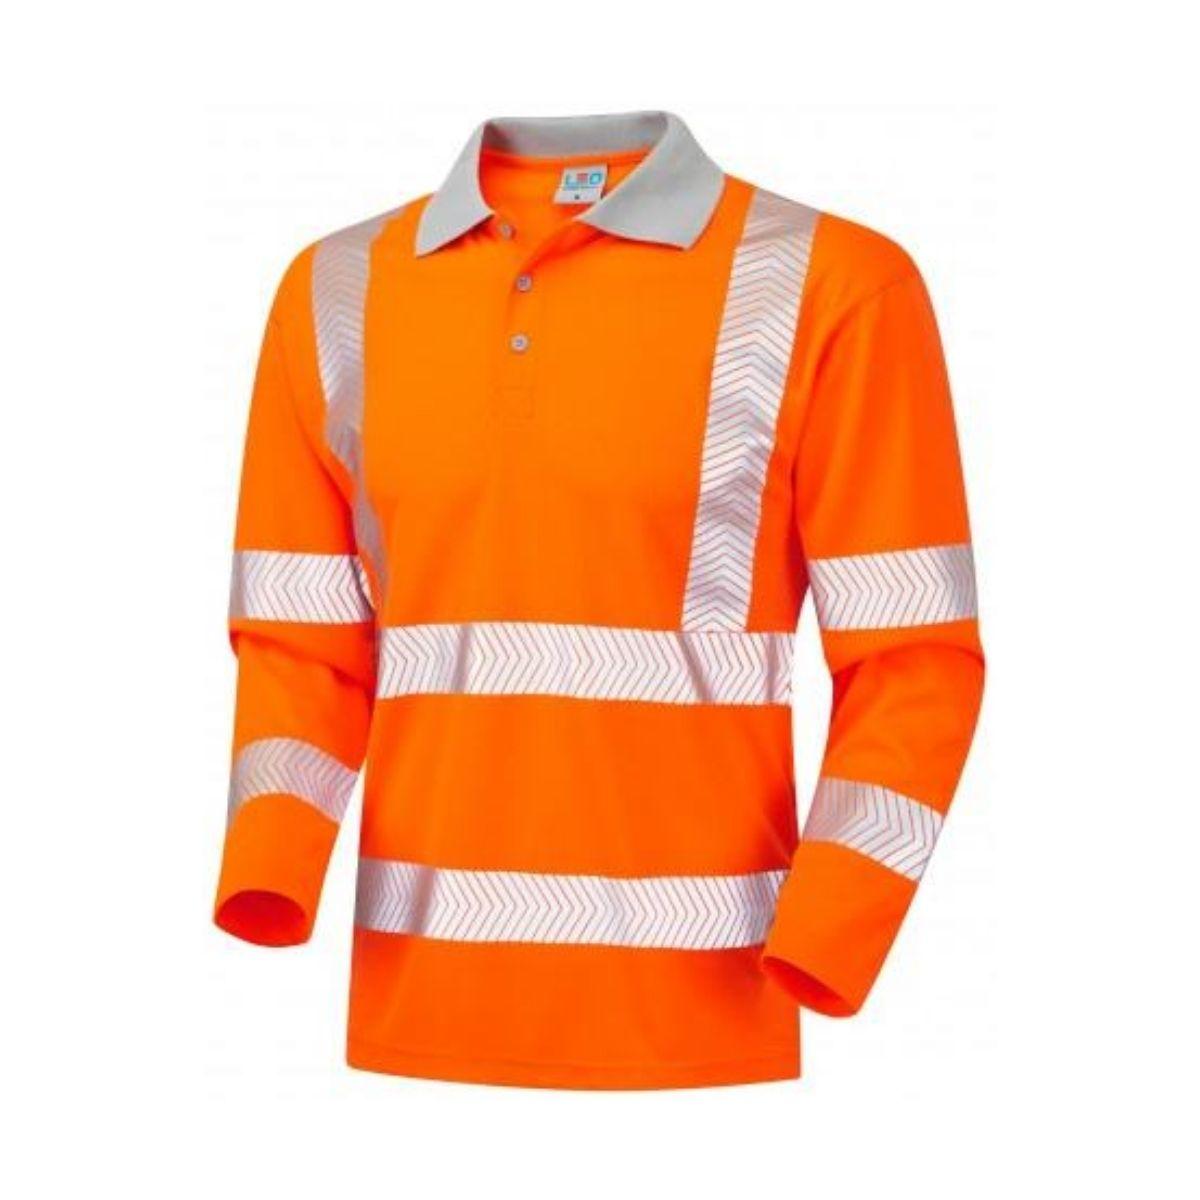 HV0038 Hi-Vis Long Sleeve Coolvis Polo Shirt - Orange